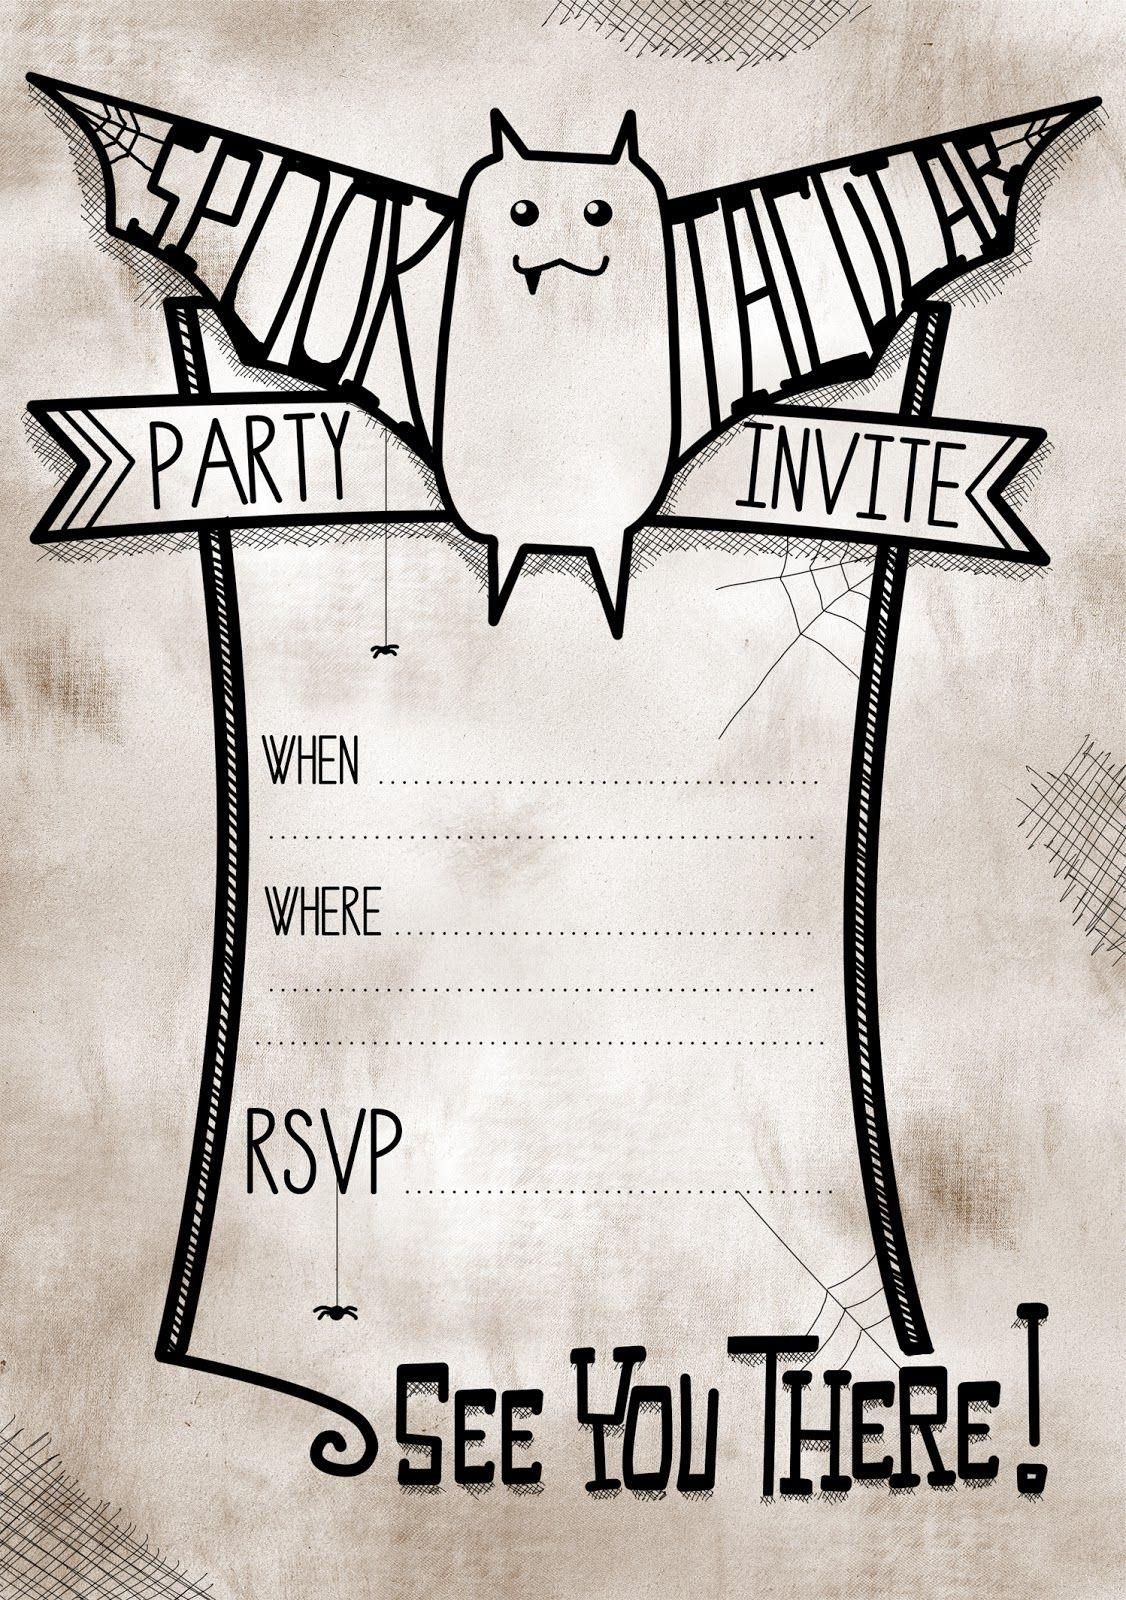 006 Impressive Free Halloween Invite Template Idea  Templates Party Invitation For WordFull